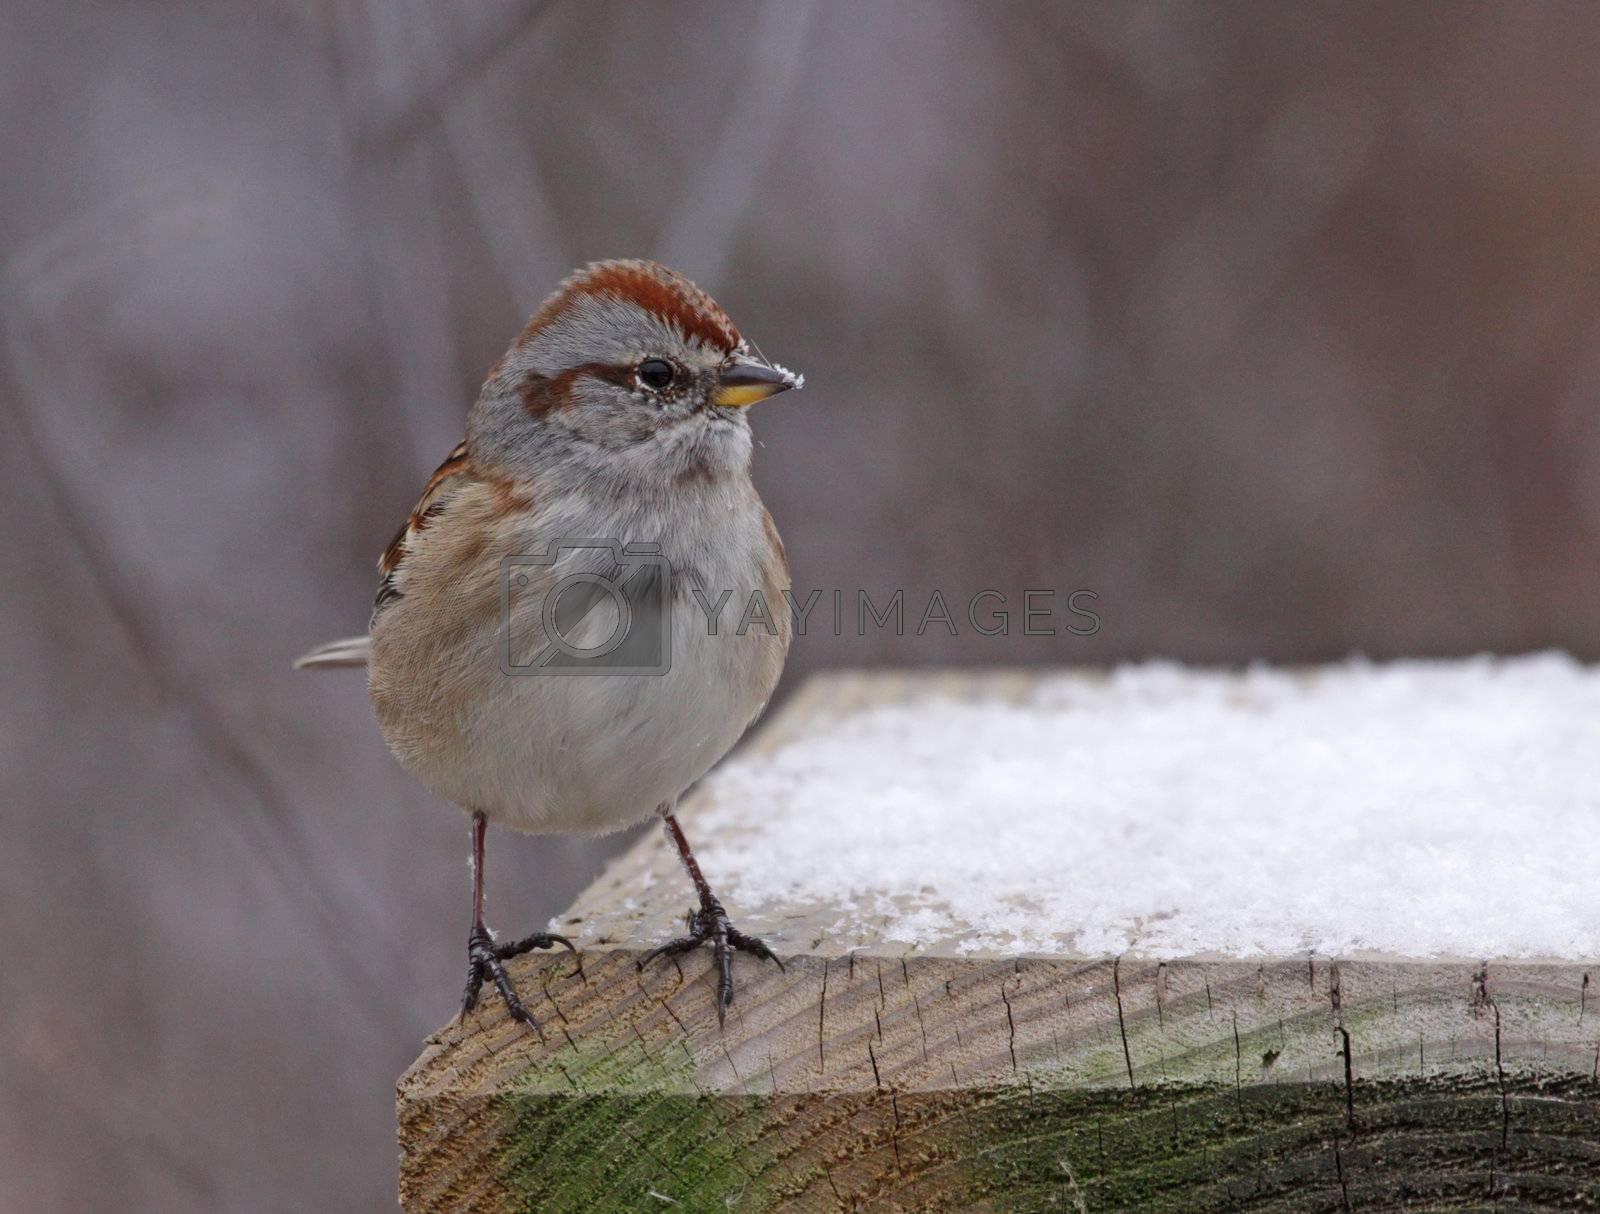 An American Tree Sparrow (Spizella arborea) sitting on a  bird feeder in winter.  Shot in Southern Ontario, Canada.